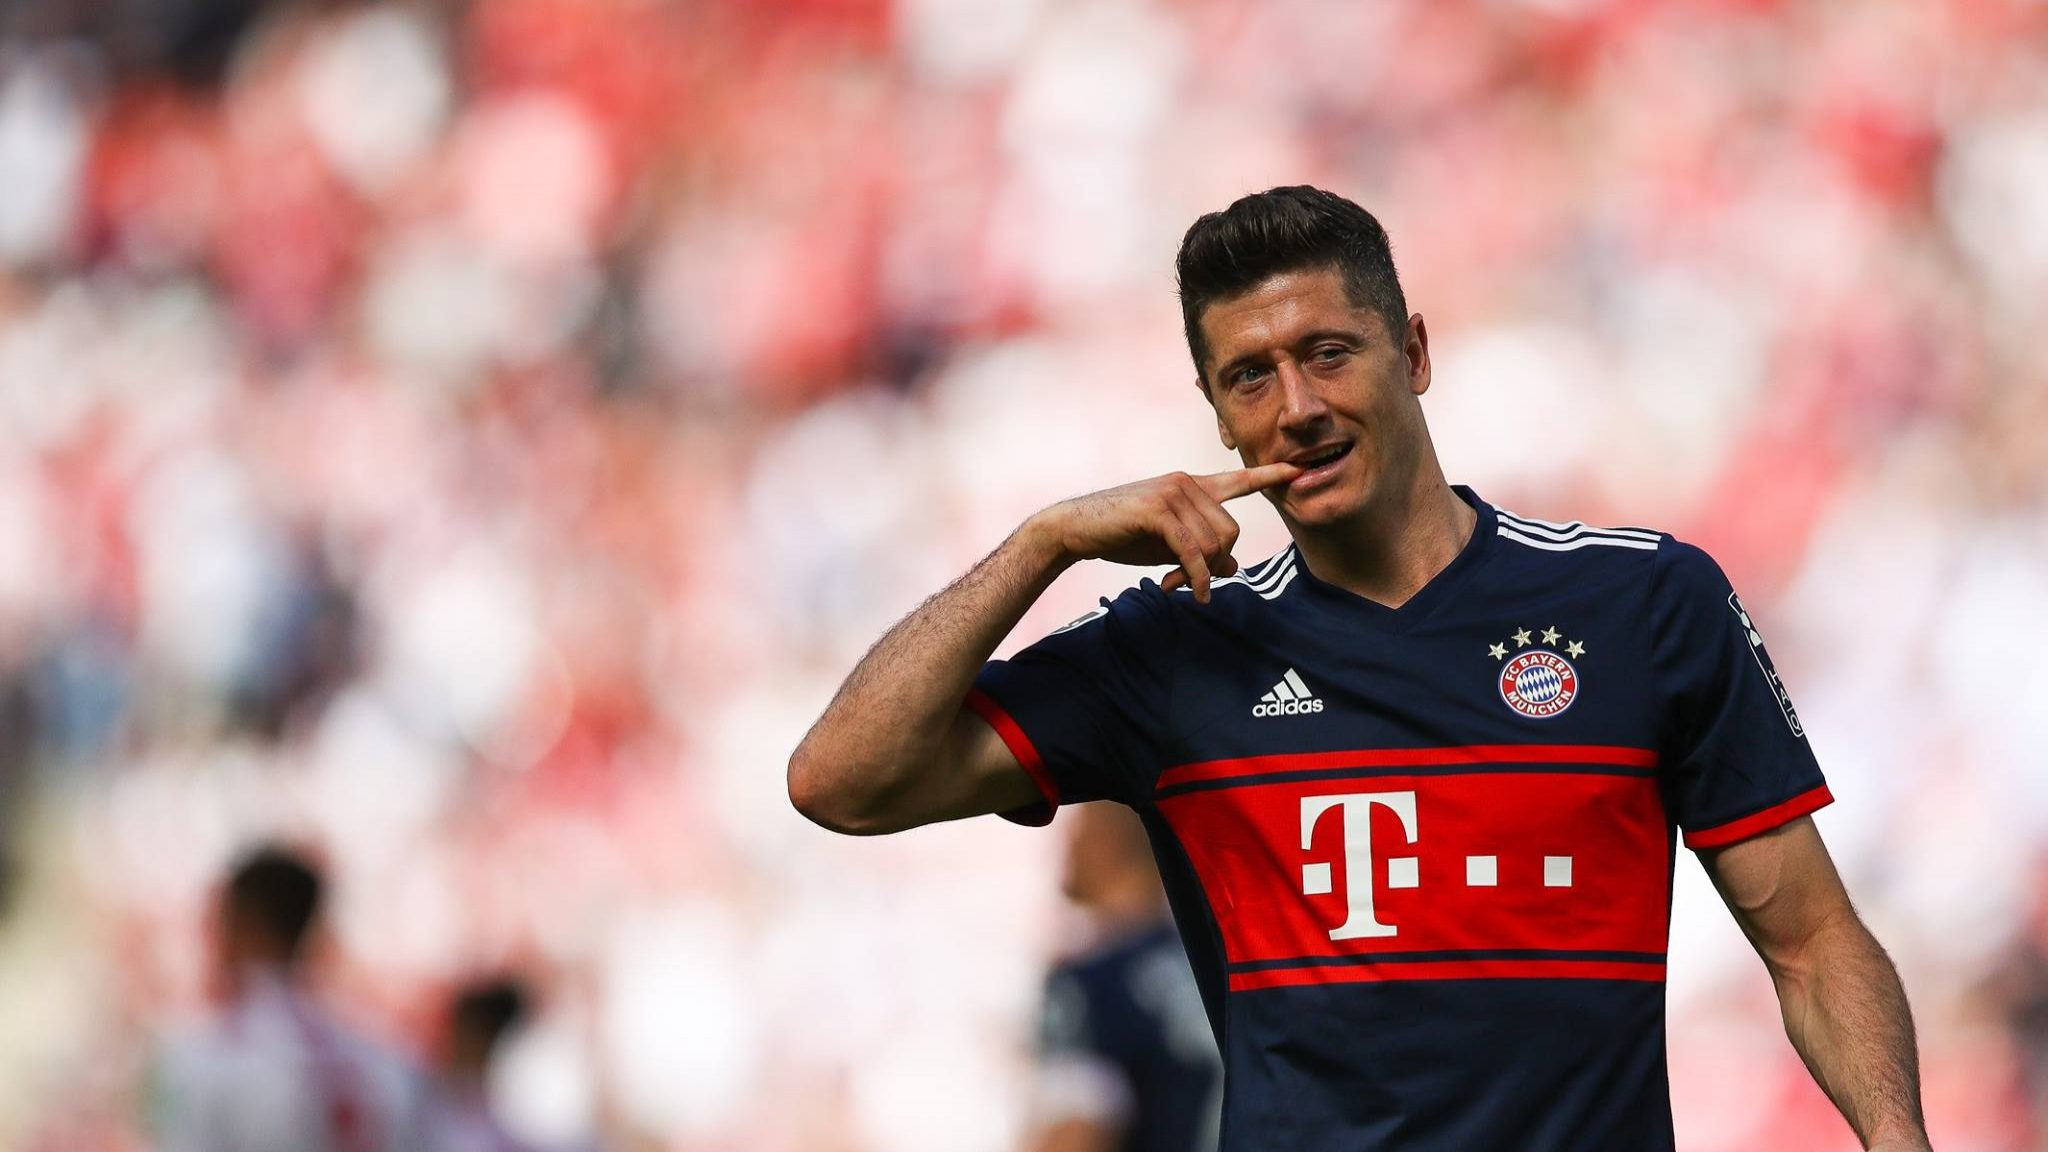 Eleven Sports vai transmitir jogos da Bundesliga